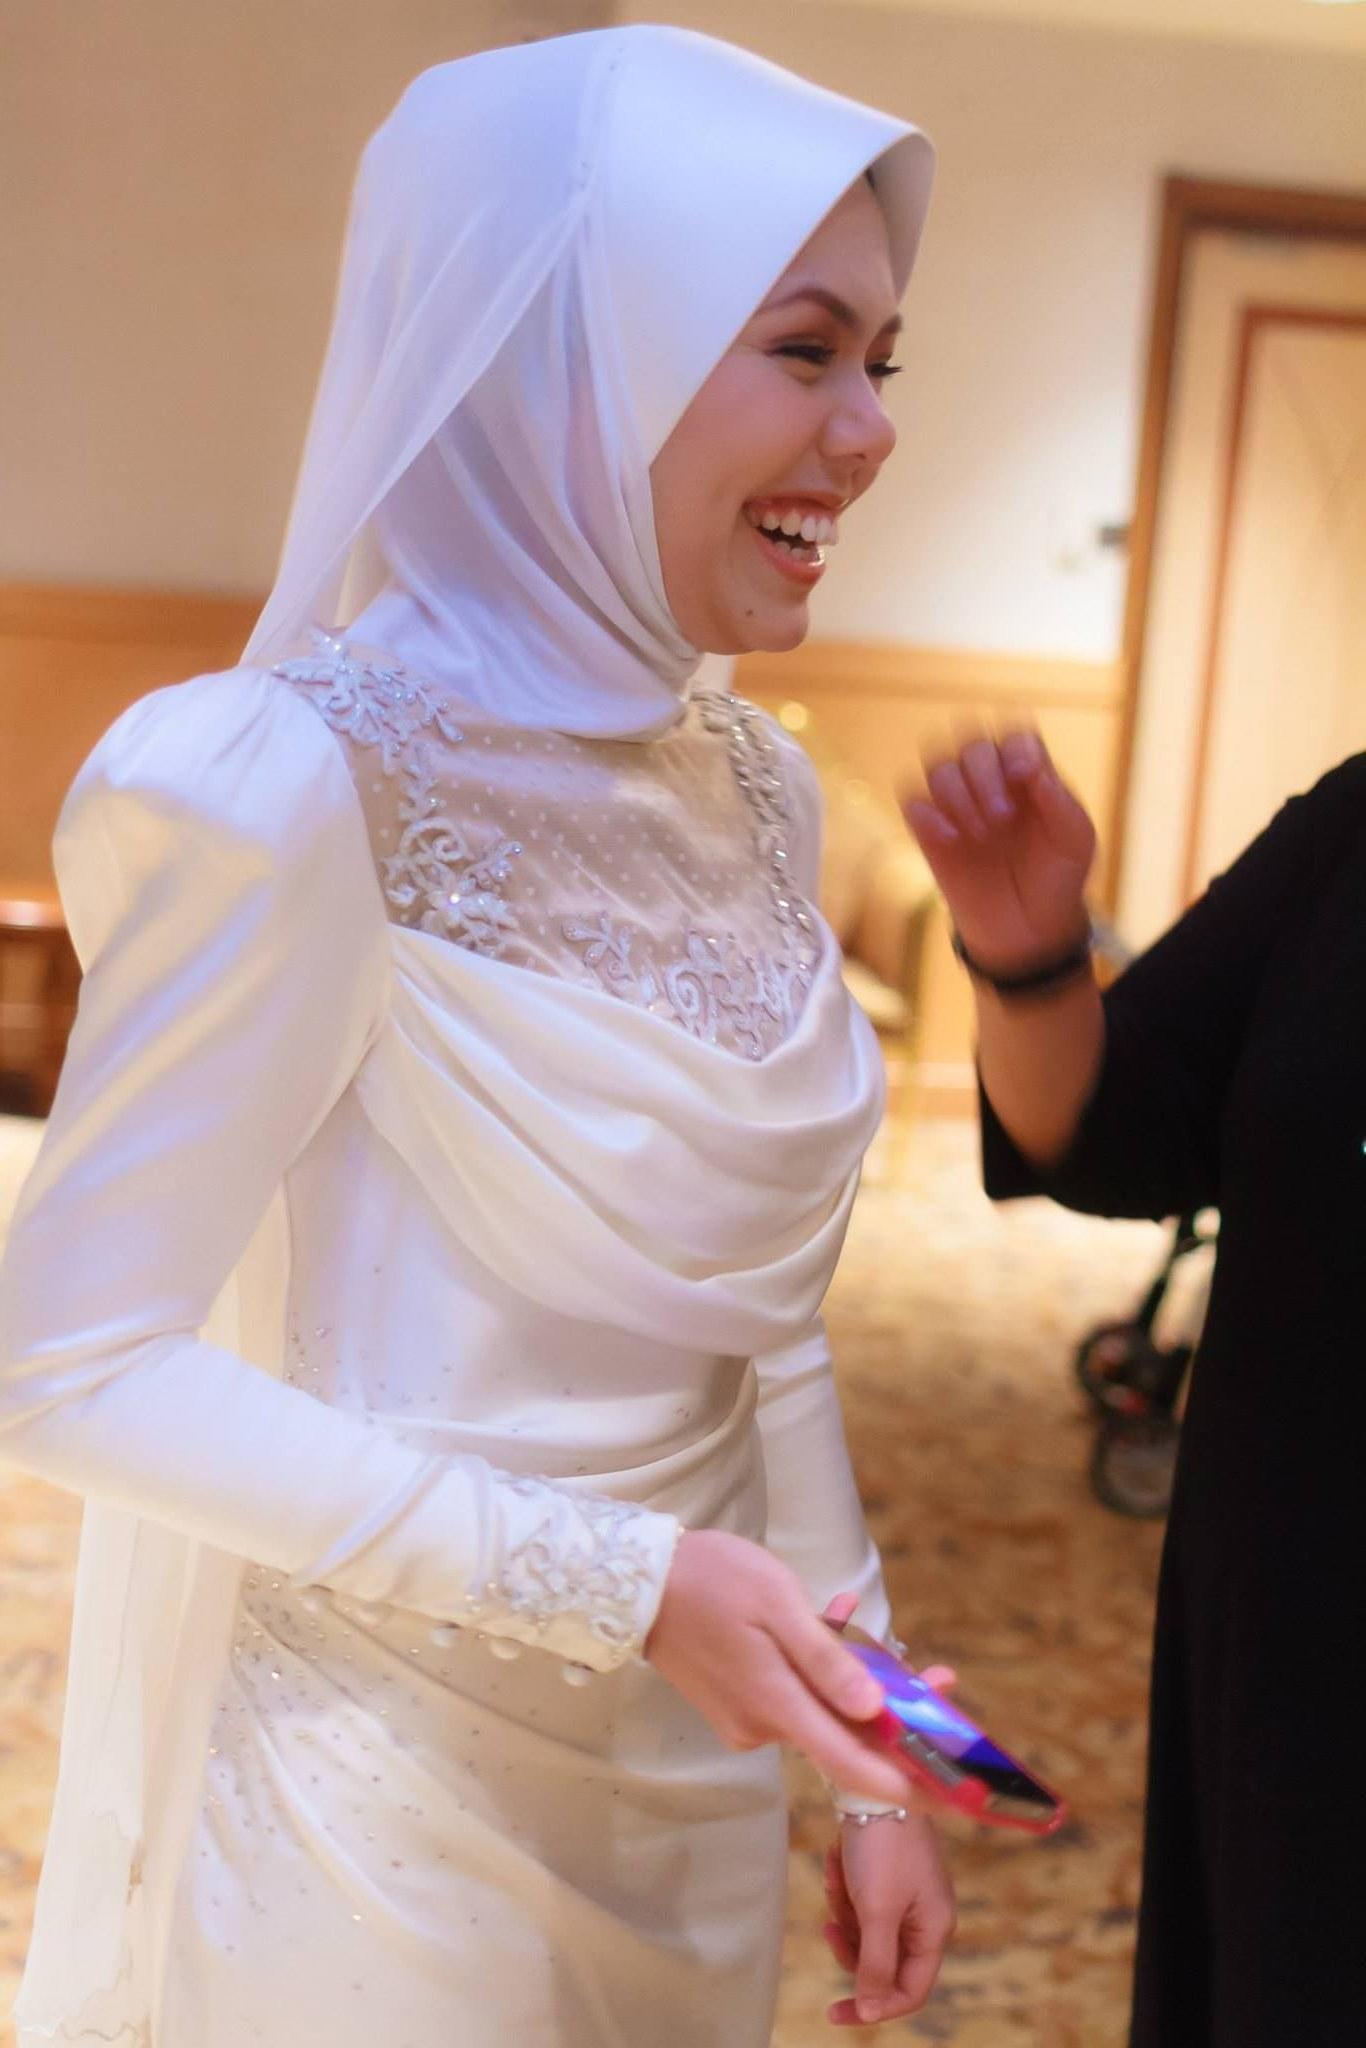 Inspirasi Baju Pengantin Muslim Adat Sunda Nkde Baju Pengantin Moden Baju Pengantin songket by Melinda